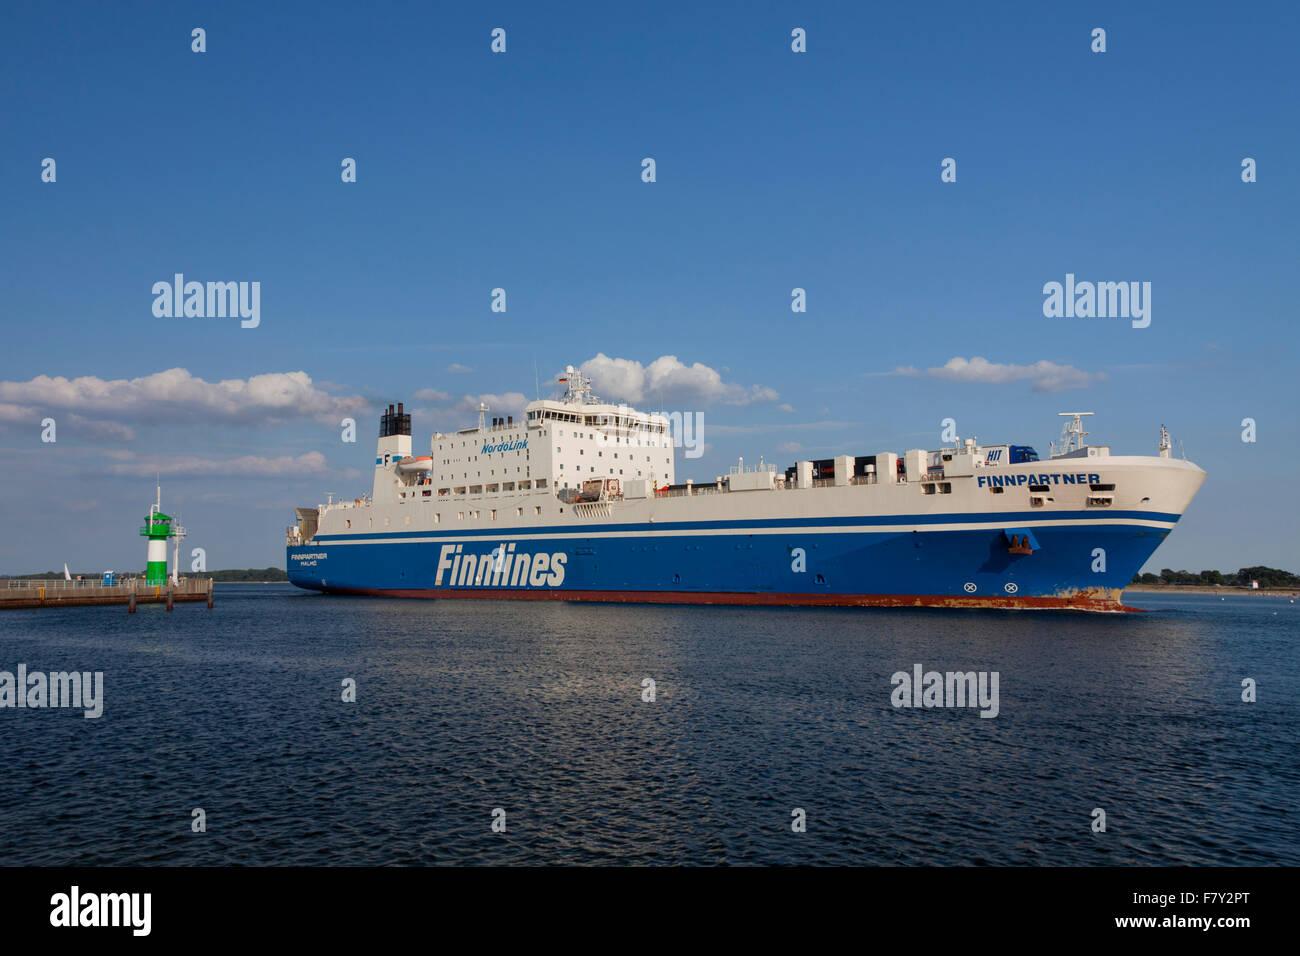 Ro-ro passenger ferry Finnpartner from Finnlines passing lighthouse Travemünde Nordmole, Travemuende, Lübeck, - Stock Image